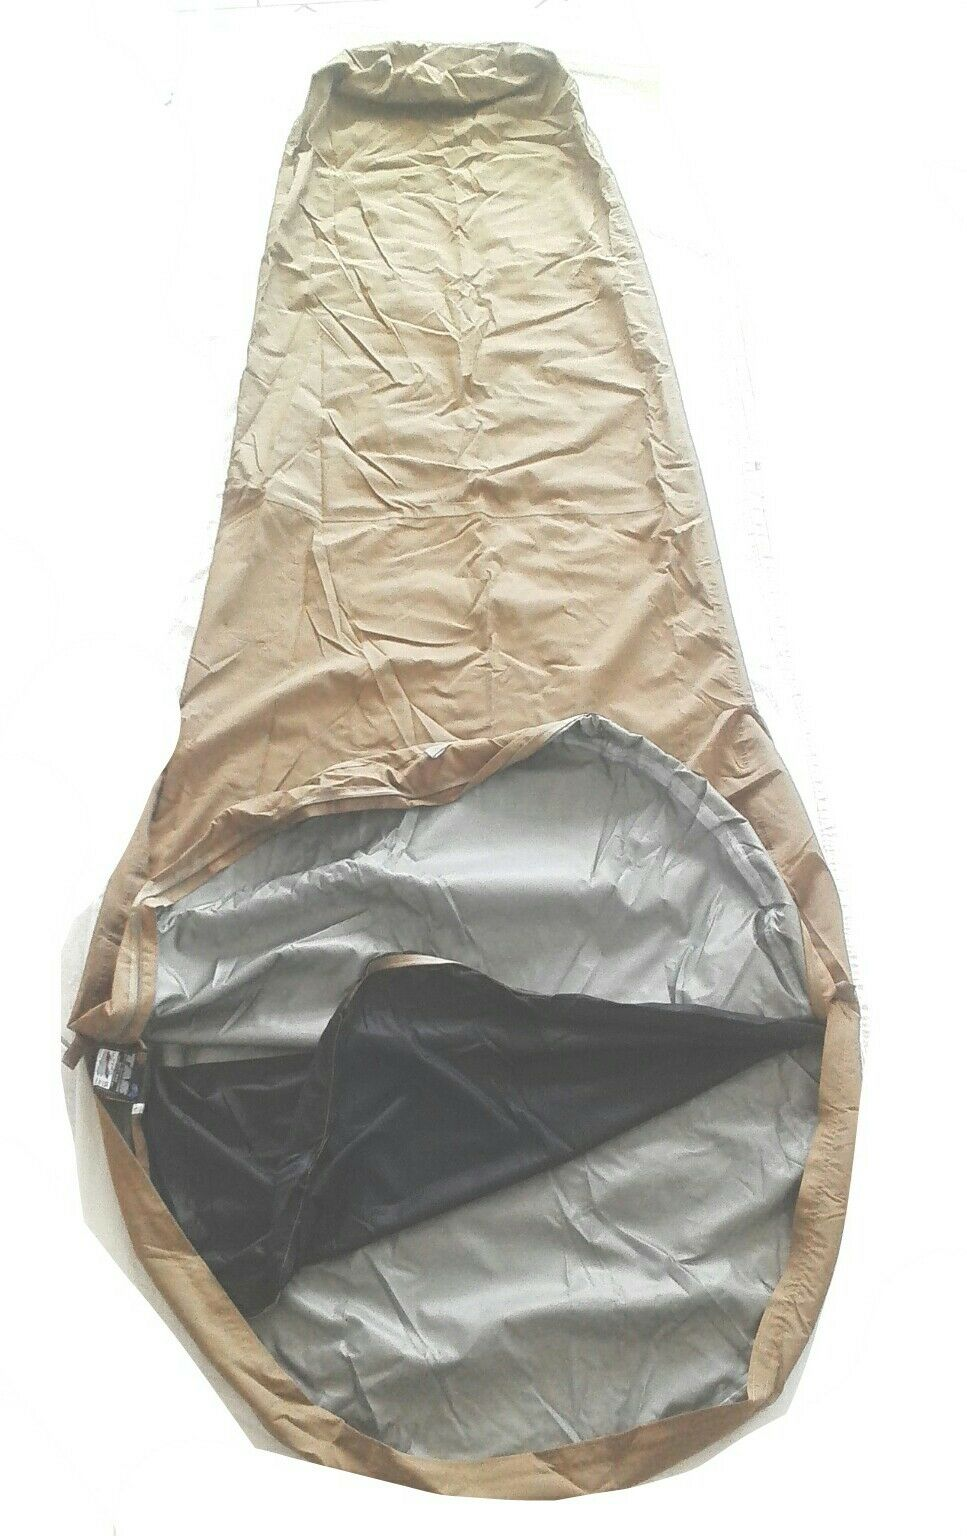 AUSTRALIAN MIL SPEC BIVVY BAG KHAKI LARGE 3 LAYER FABRIC 232X107X82CM